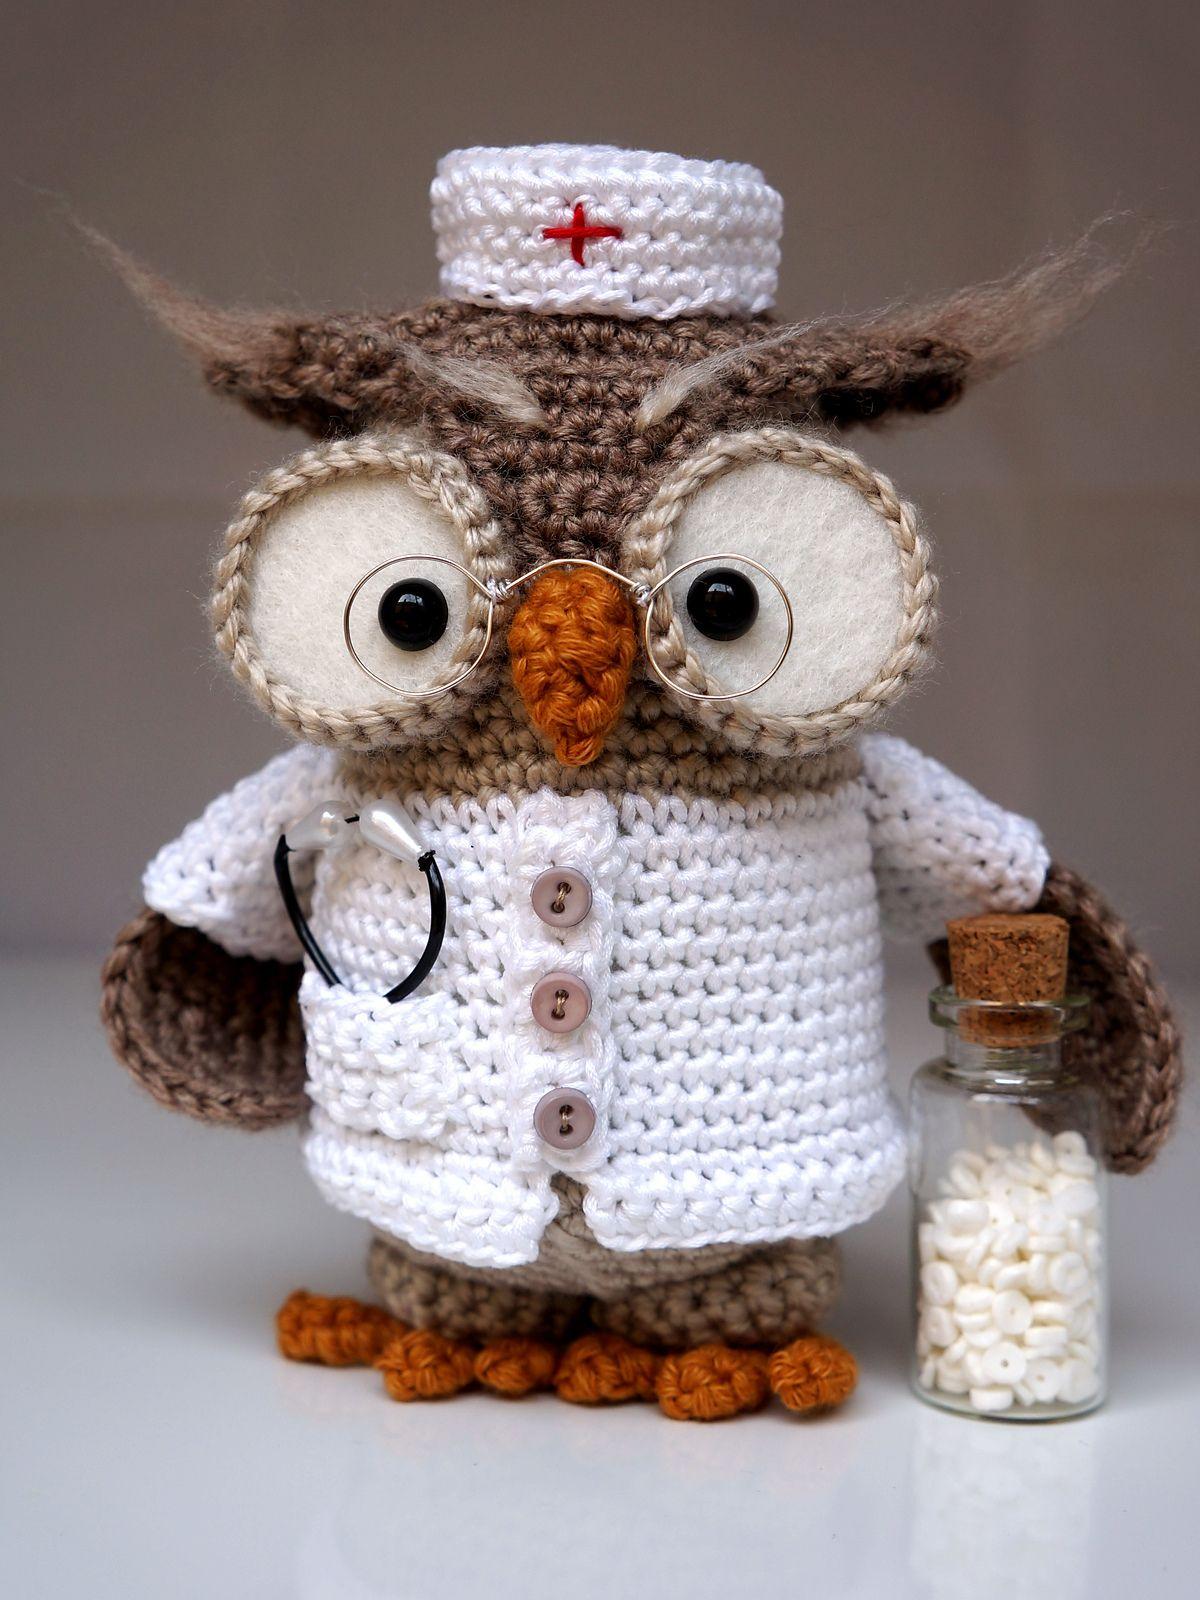 Owl Amigurumi Pattern Cutest Crochet Ideas Video Tutorial | 1600x1200